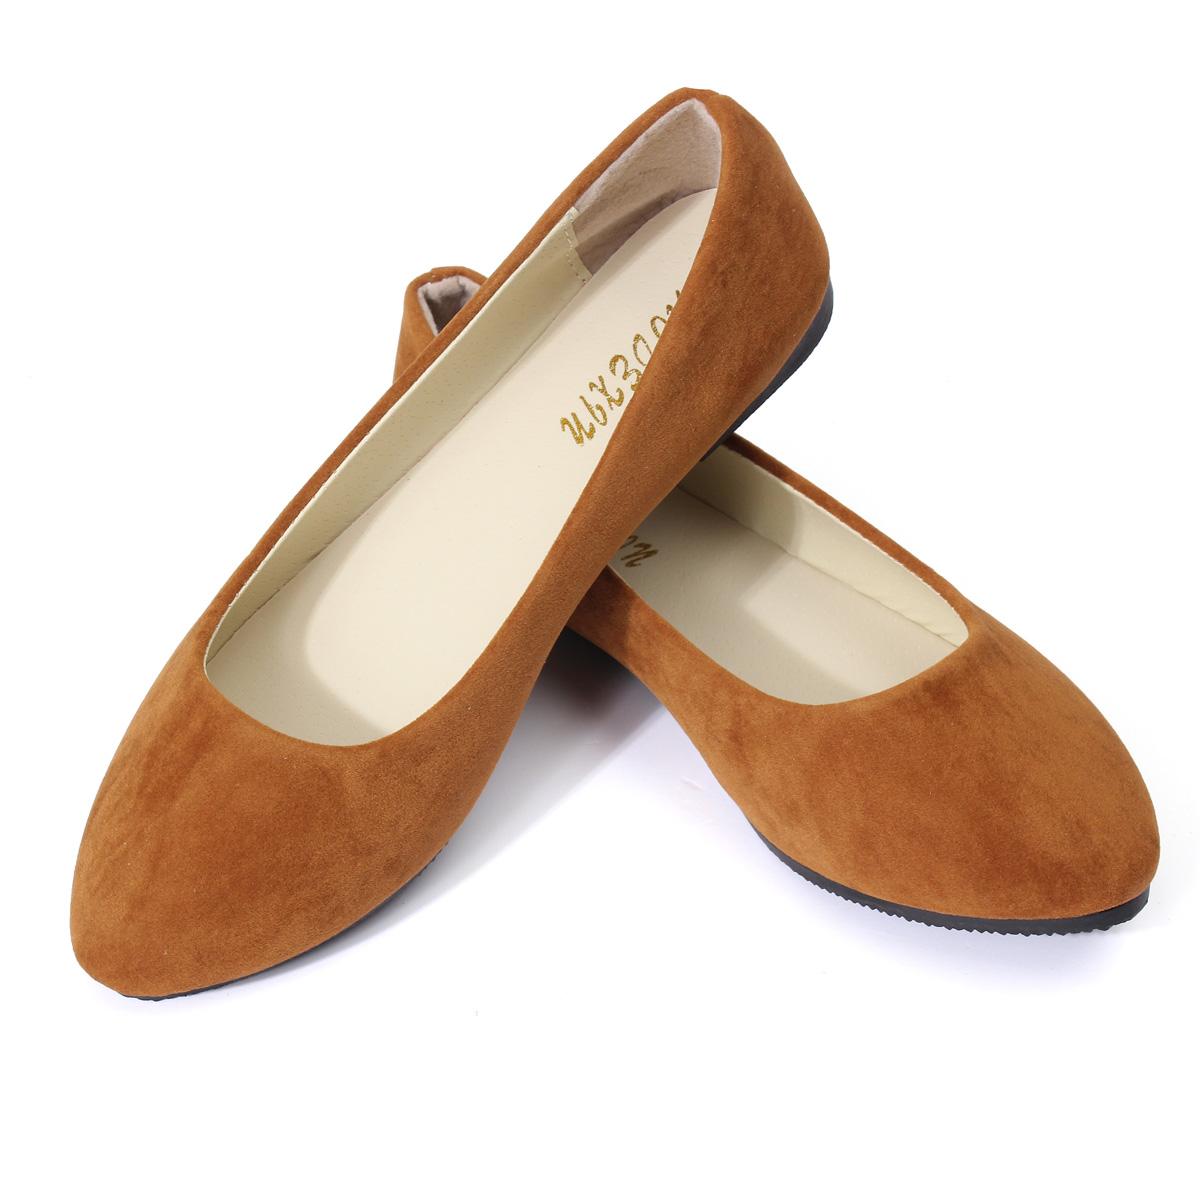 damen neu ballerina halbschuhe ballerinas schuhe wildleder slipper shoes flach ebay. Black Bedroom Furniture Sets. Home Design Ideas